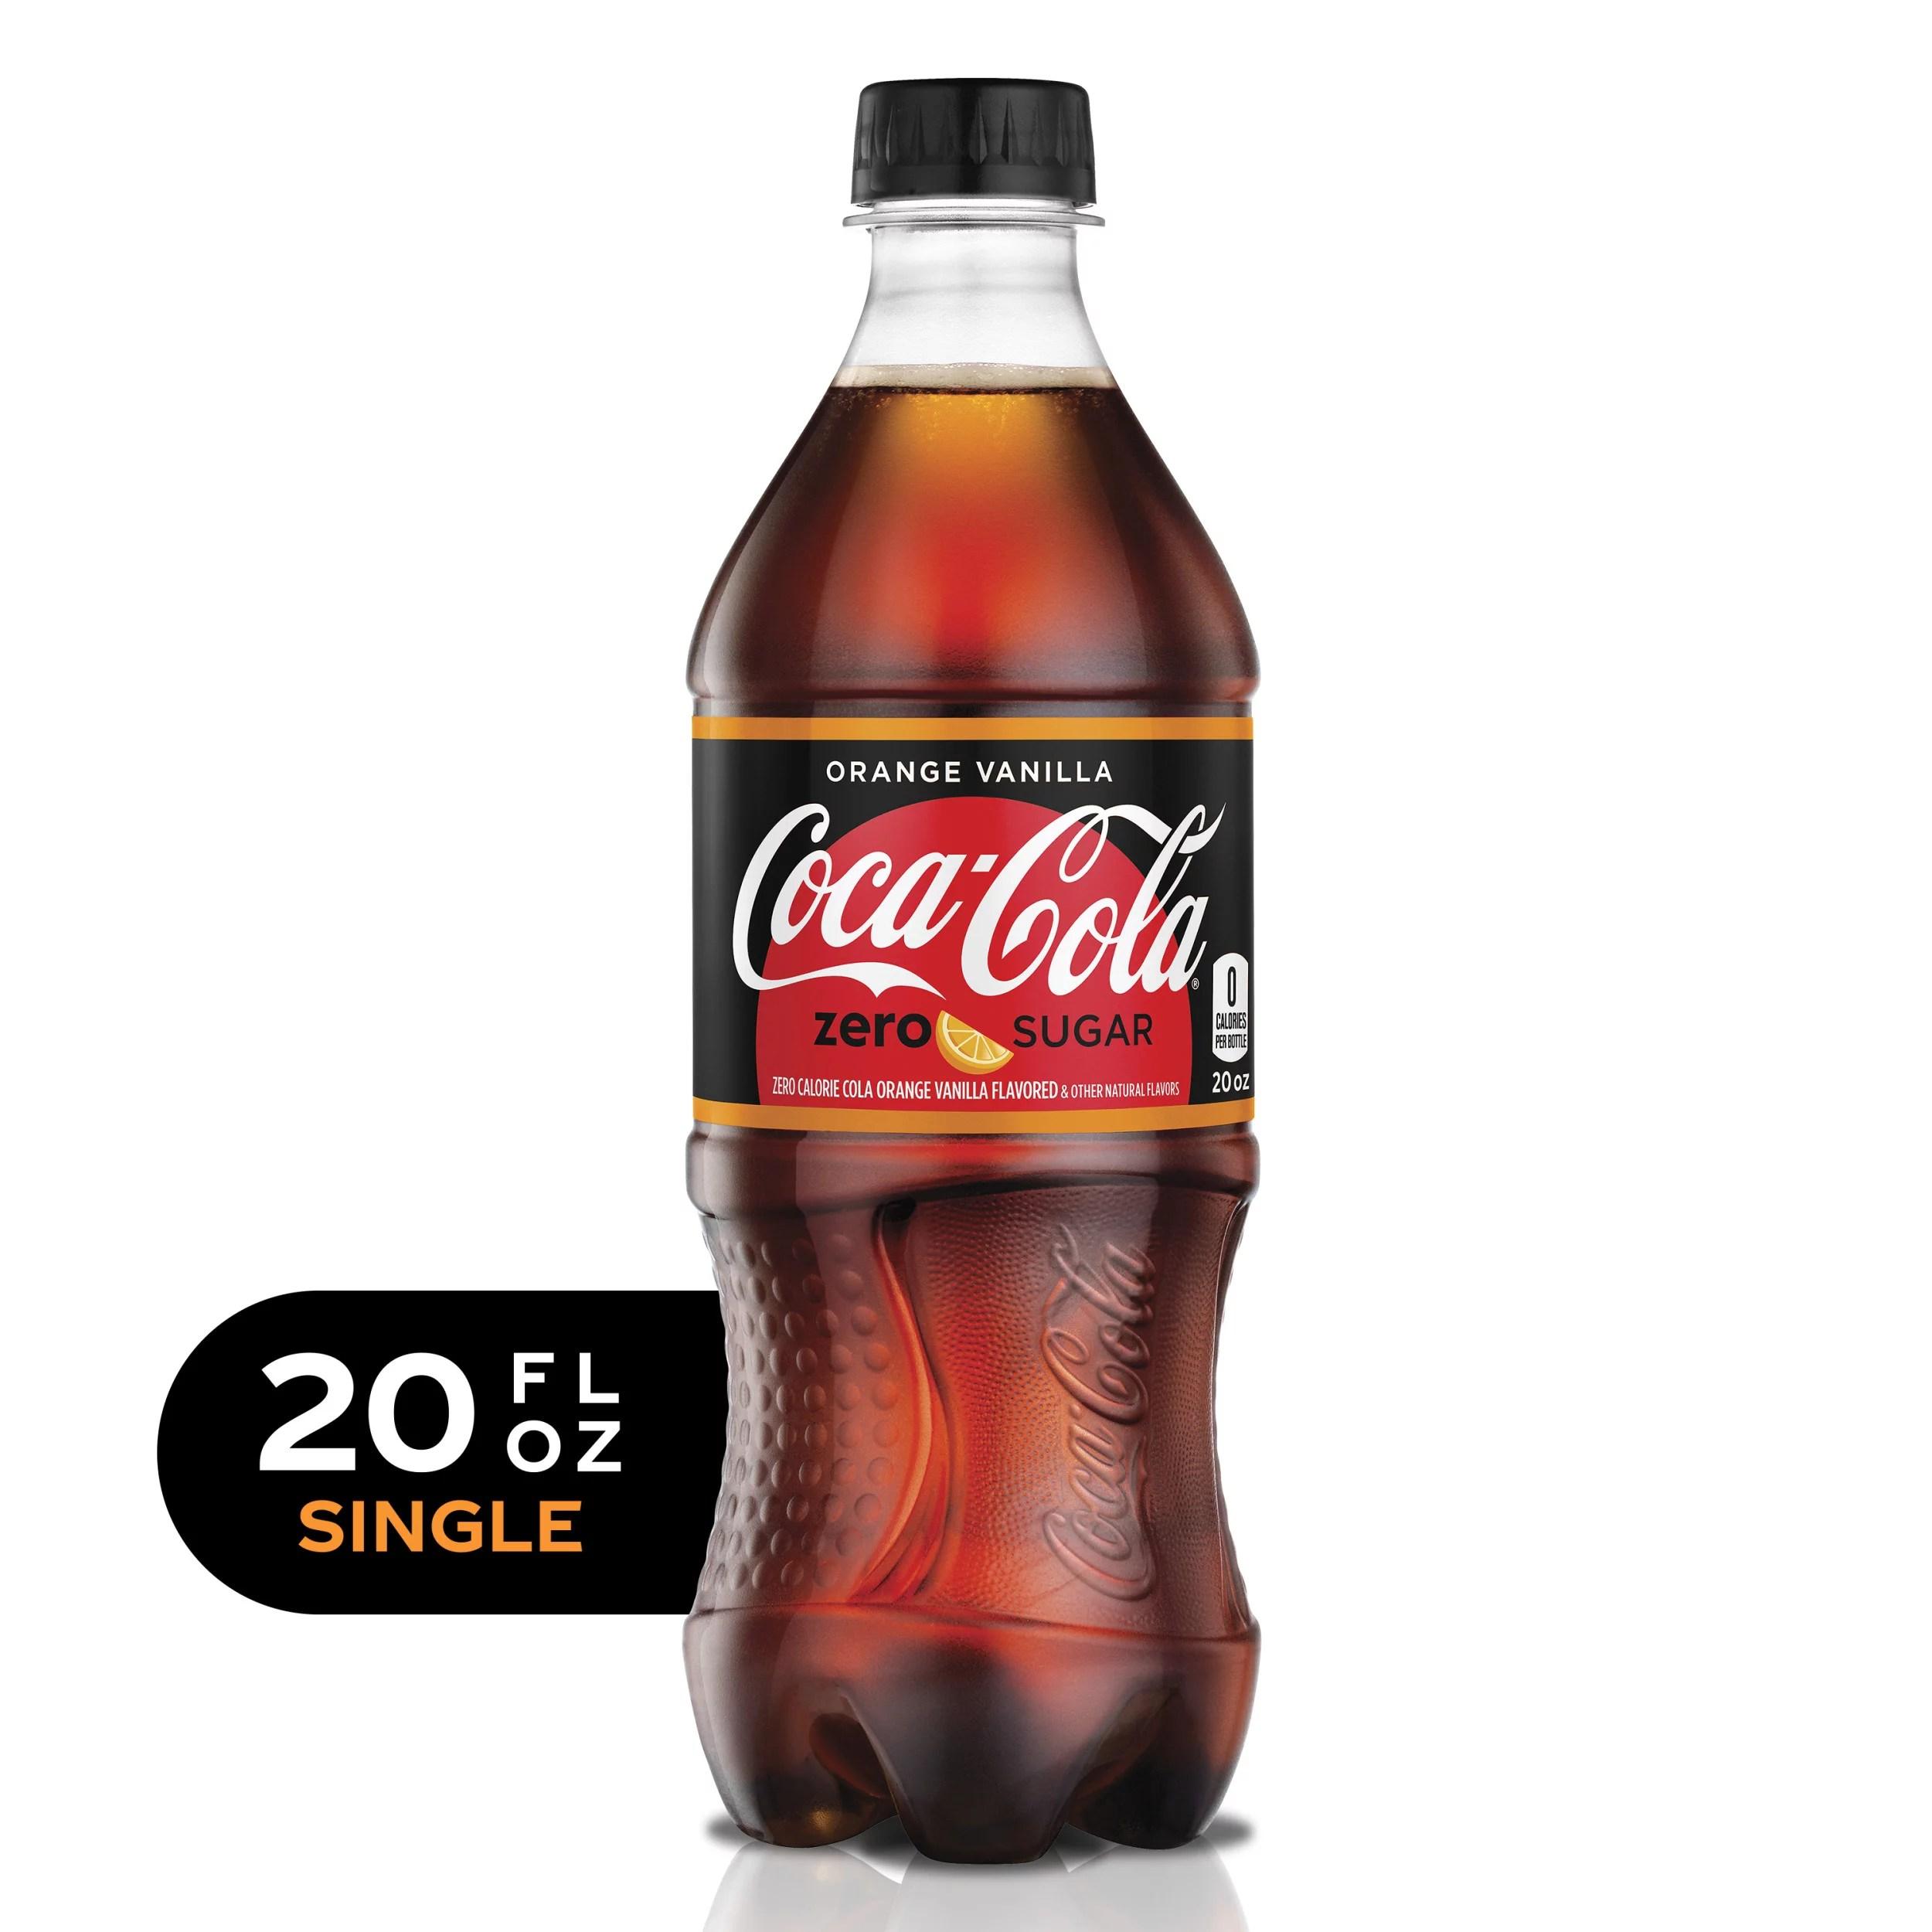 Coca-Cola Orange Vanilla Zero Sugar Diet Soda Sugar Free ...